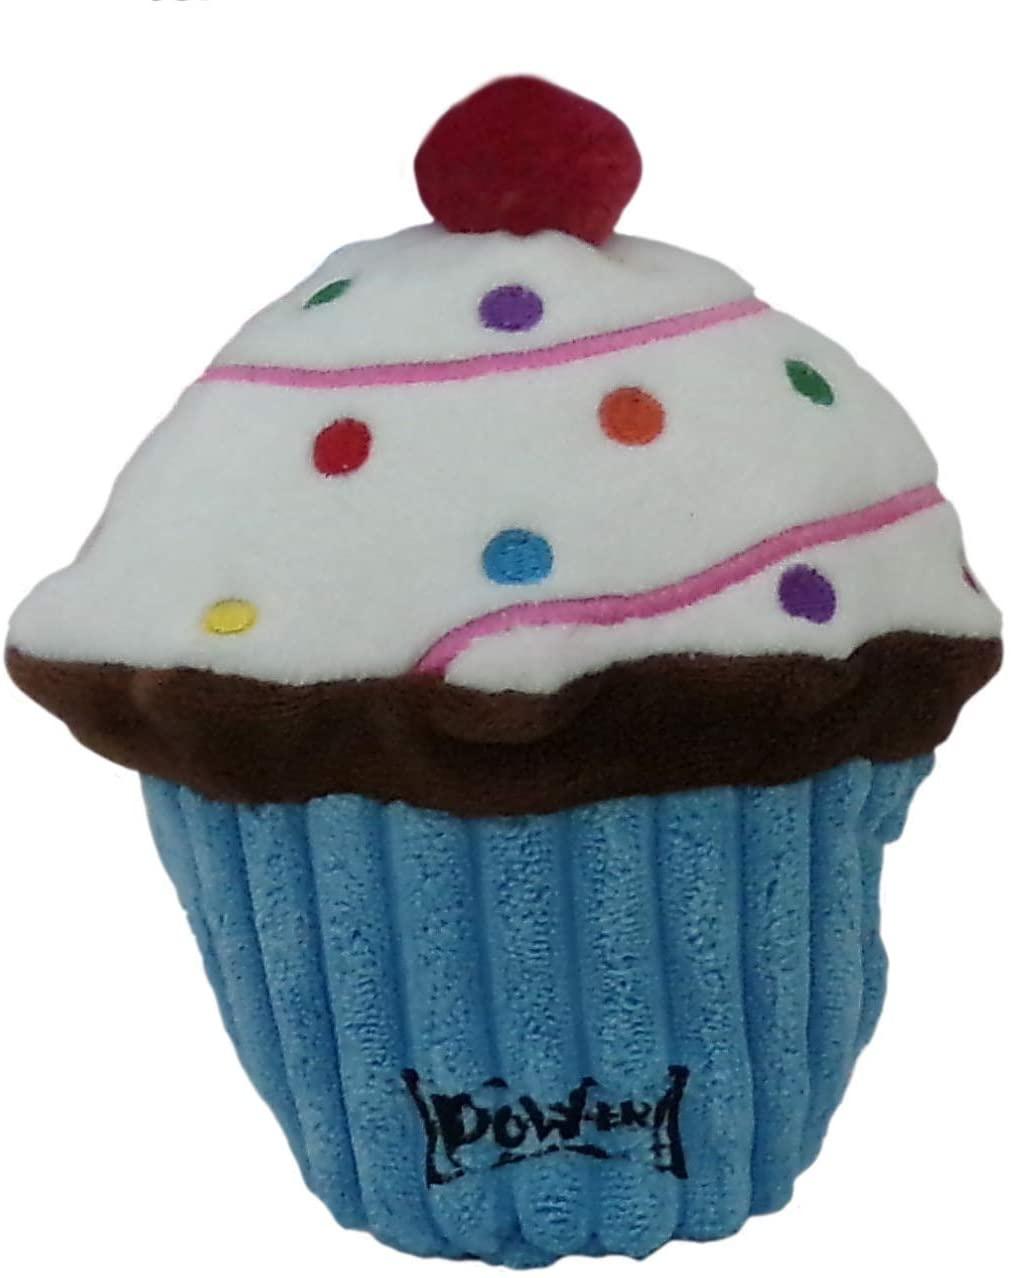 Lulubelle's Power Plush Blue Pupcake